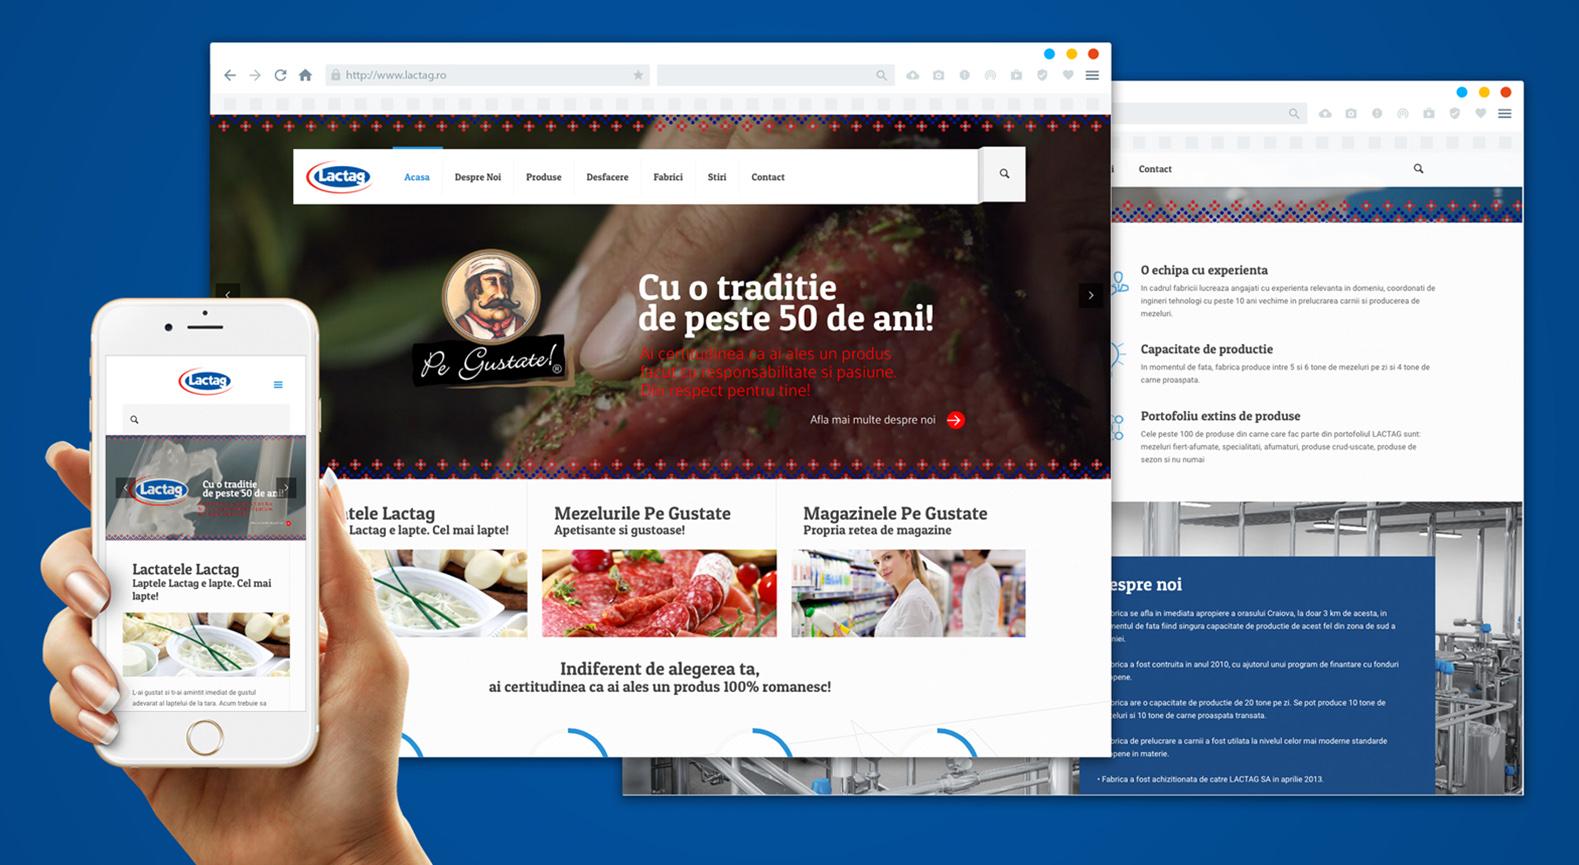 tudor_deleanu_creative_design_art_advertising_web_website__0009_Lactate Lactag